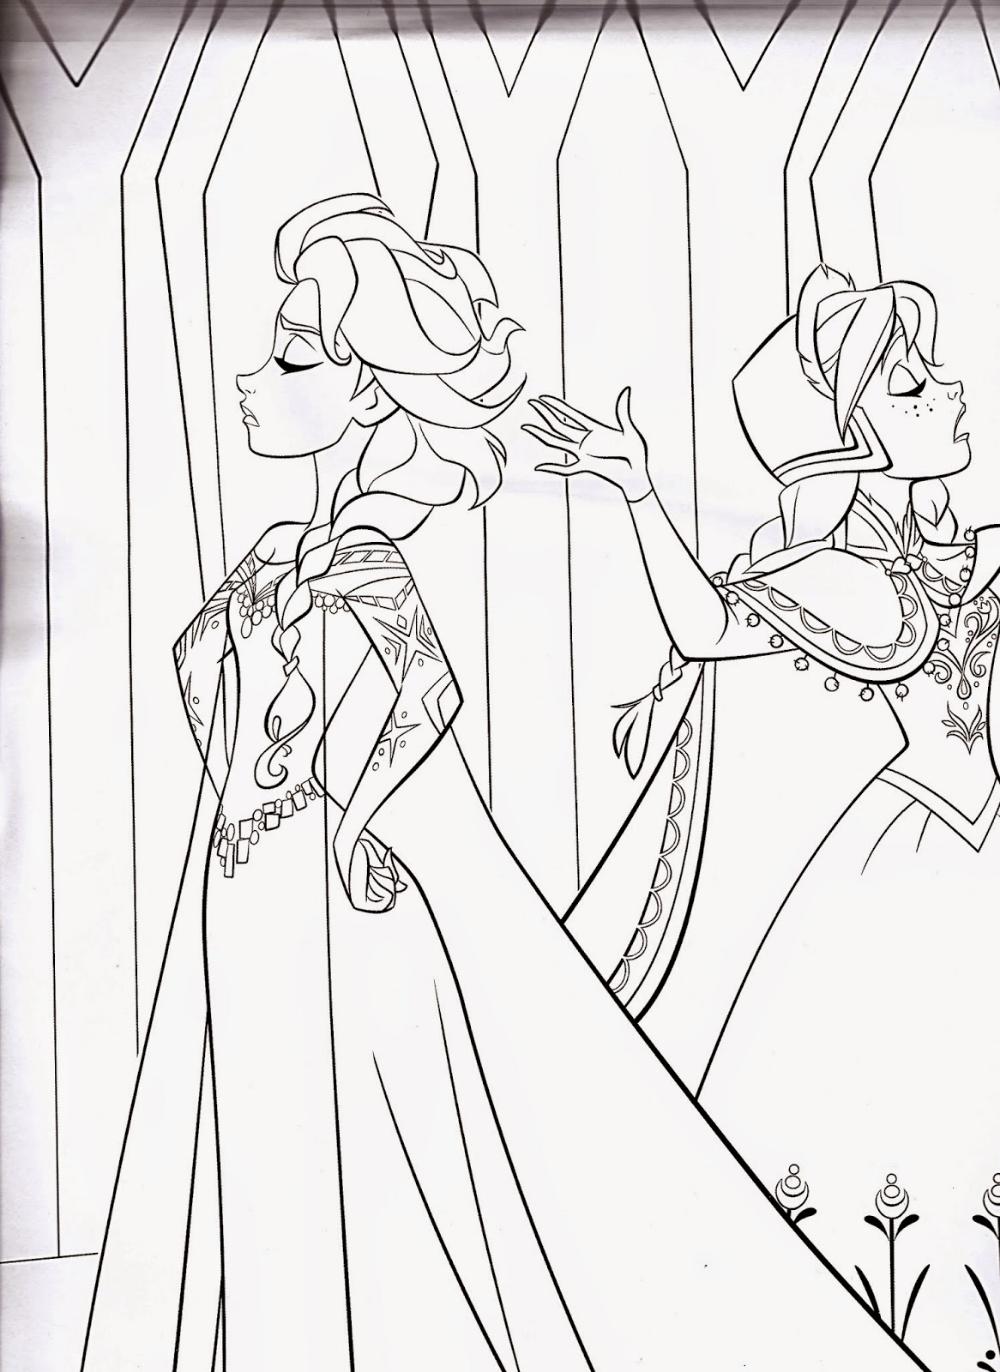 93 Colour Frozen Disney Princess Coloring Pages Halaman Mewarnai Frozen Disney Disney